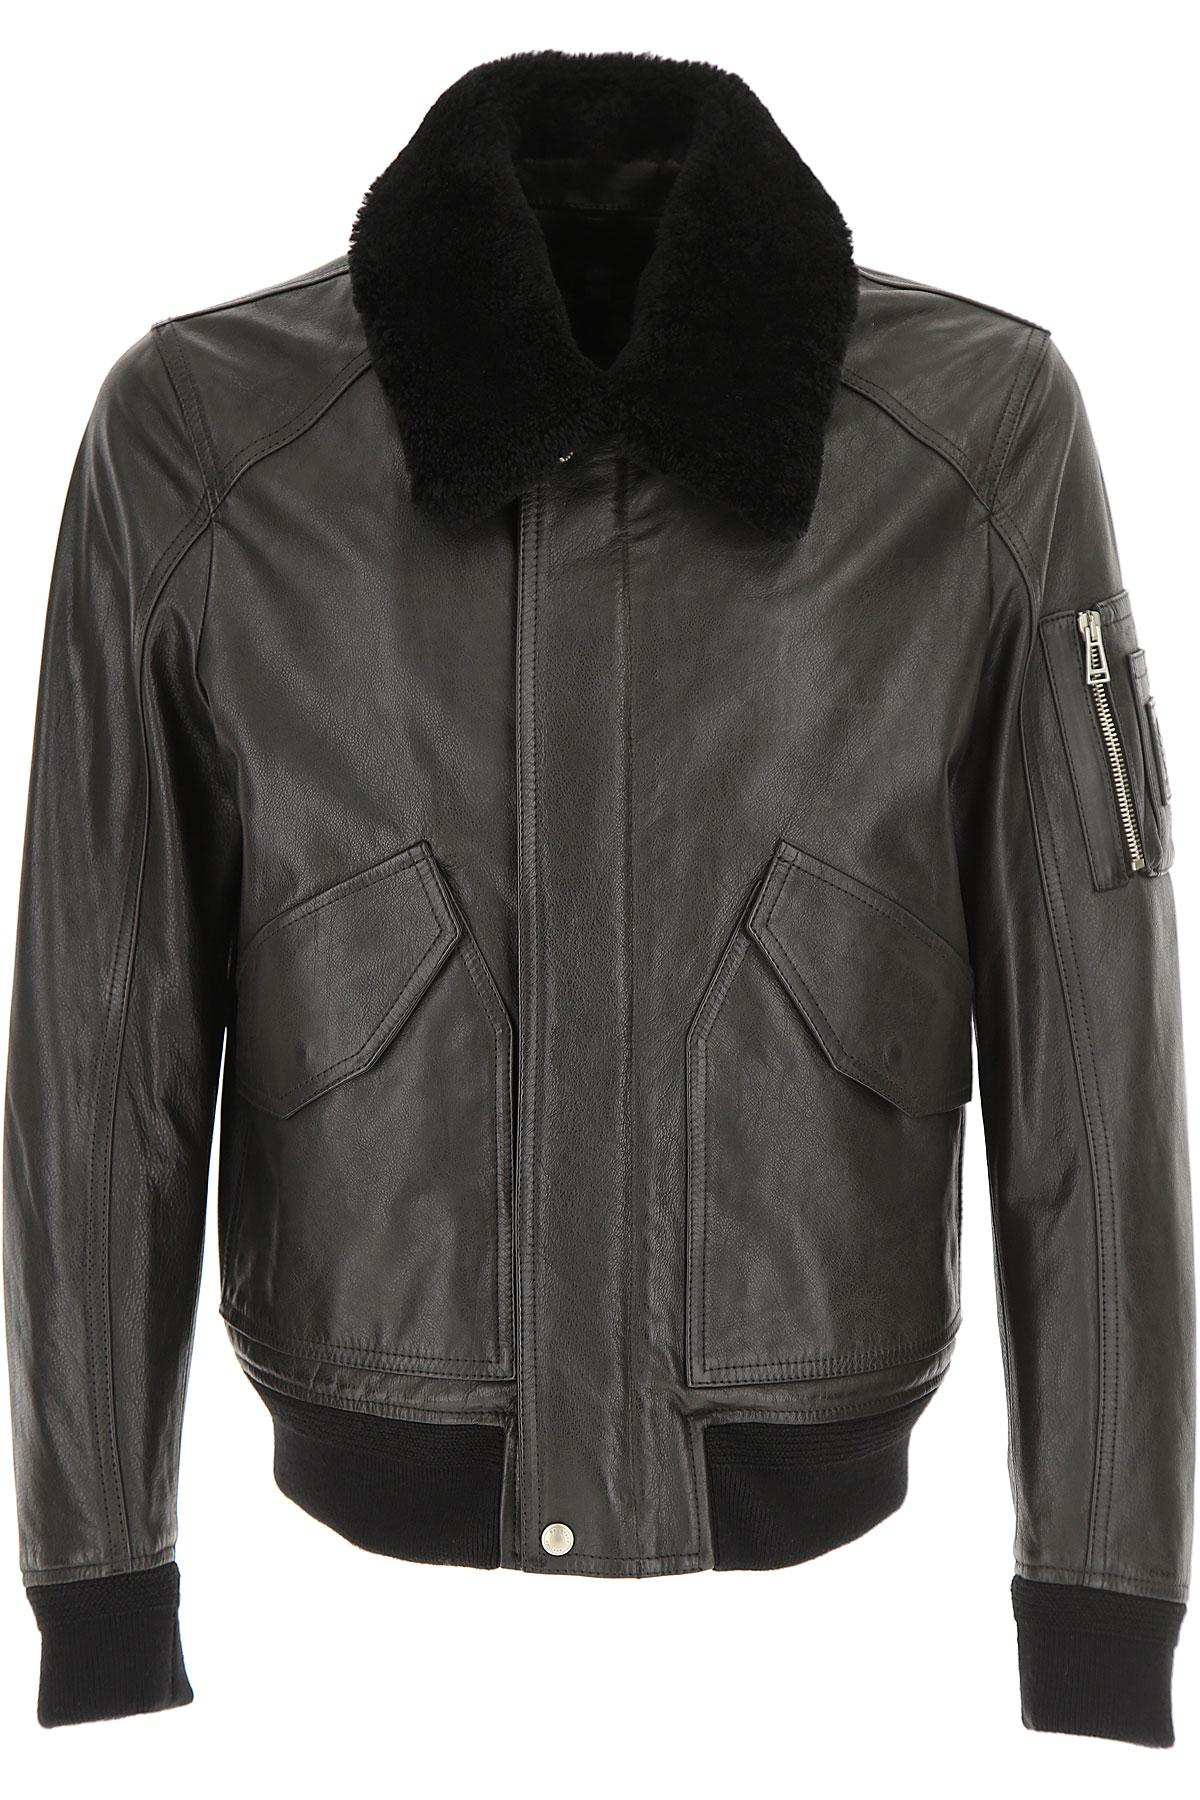 Image of Belstaff Leather Jacket for Men, Black, Leather, 2017, L M XL XXL